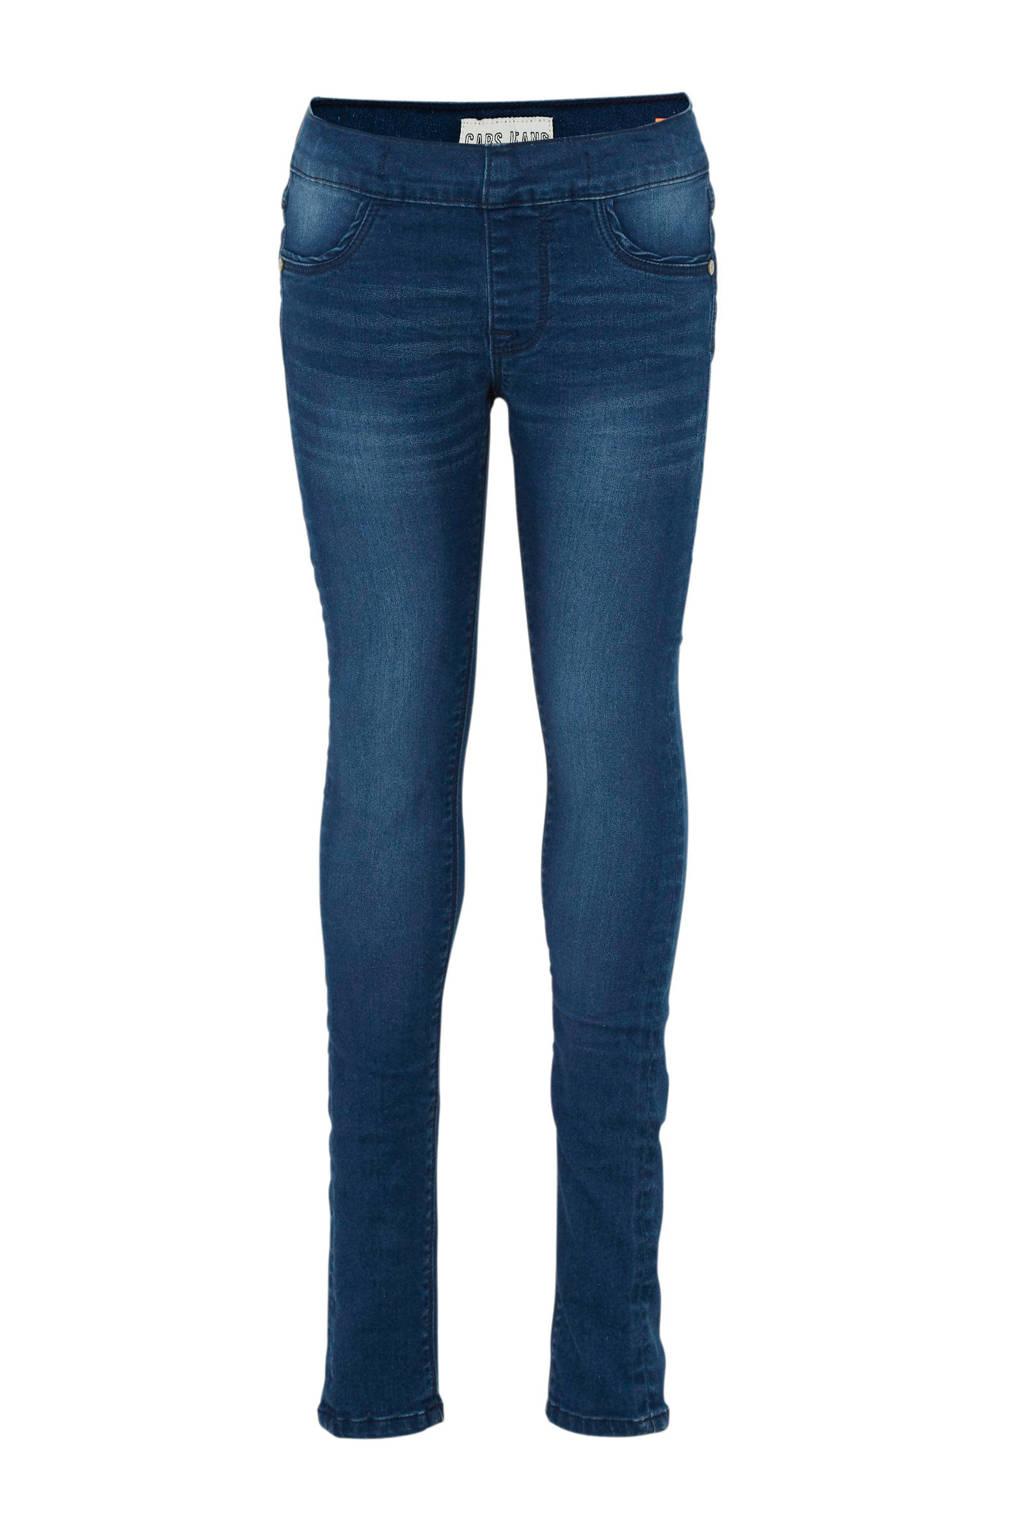 Cars super skinny jeans, 03 Dark Used